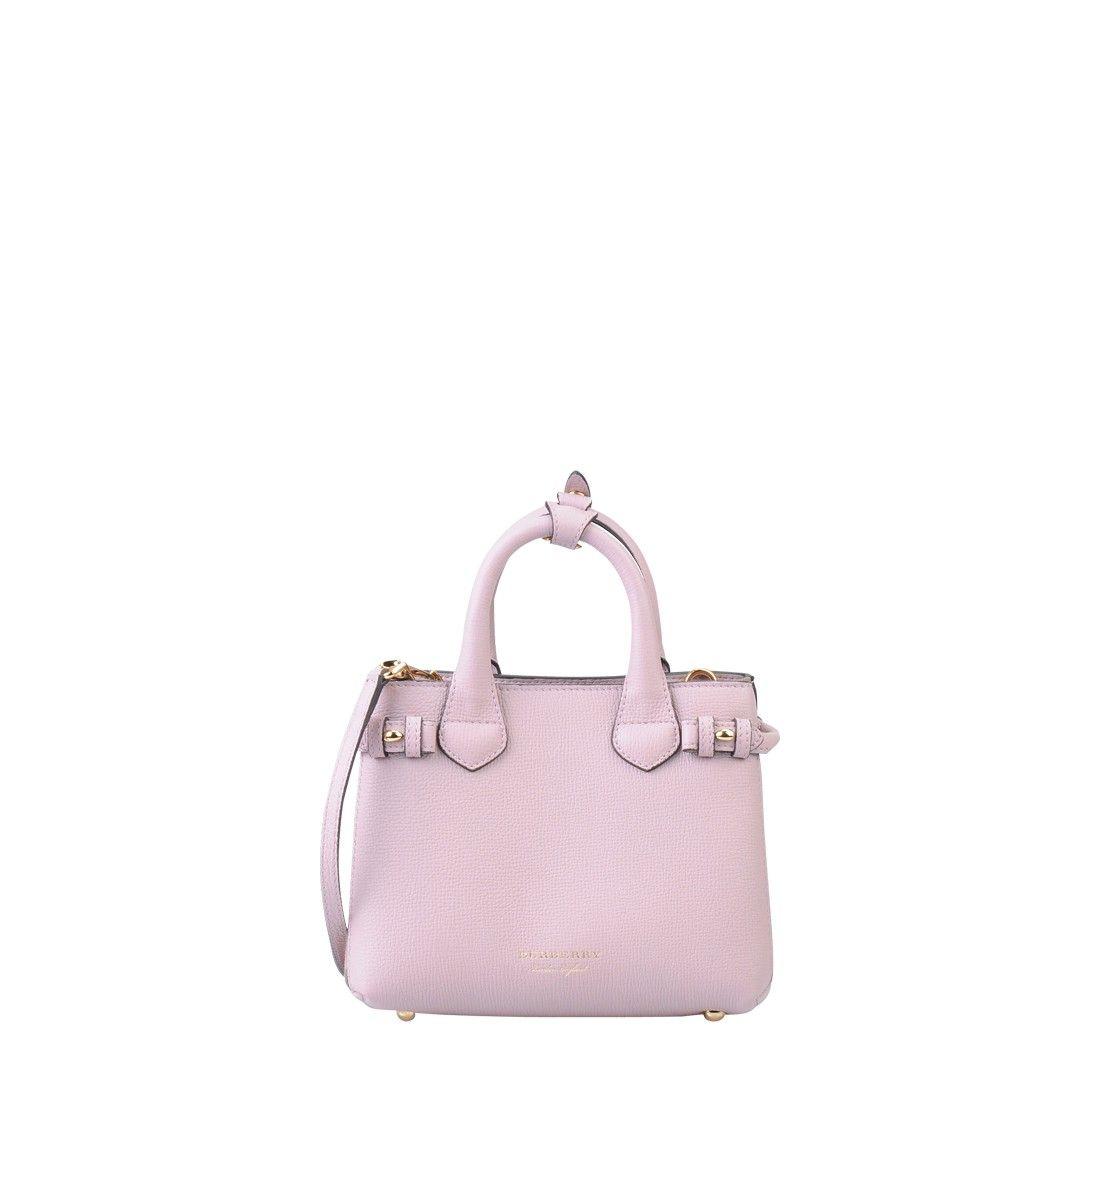 d52243b11c4 Petit Sac Cabas Baby Banner - Burberry  mode  femme  shopsquare  tendance   sac